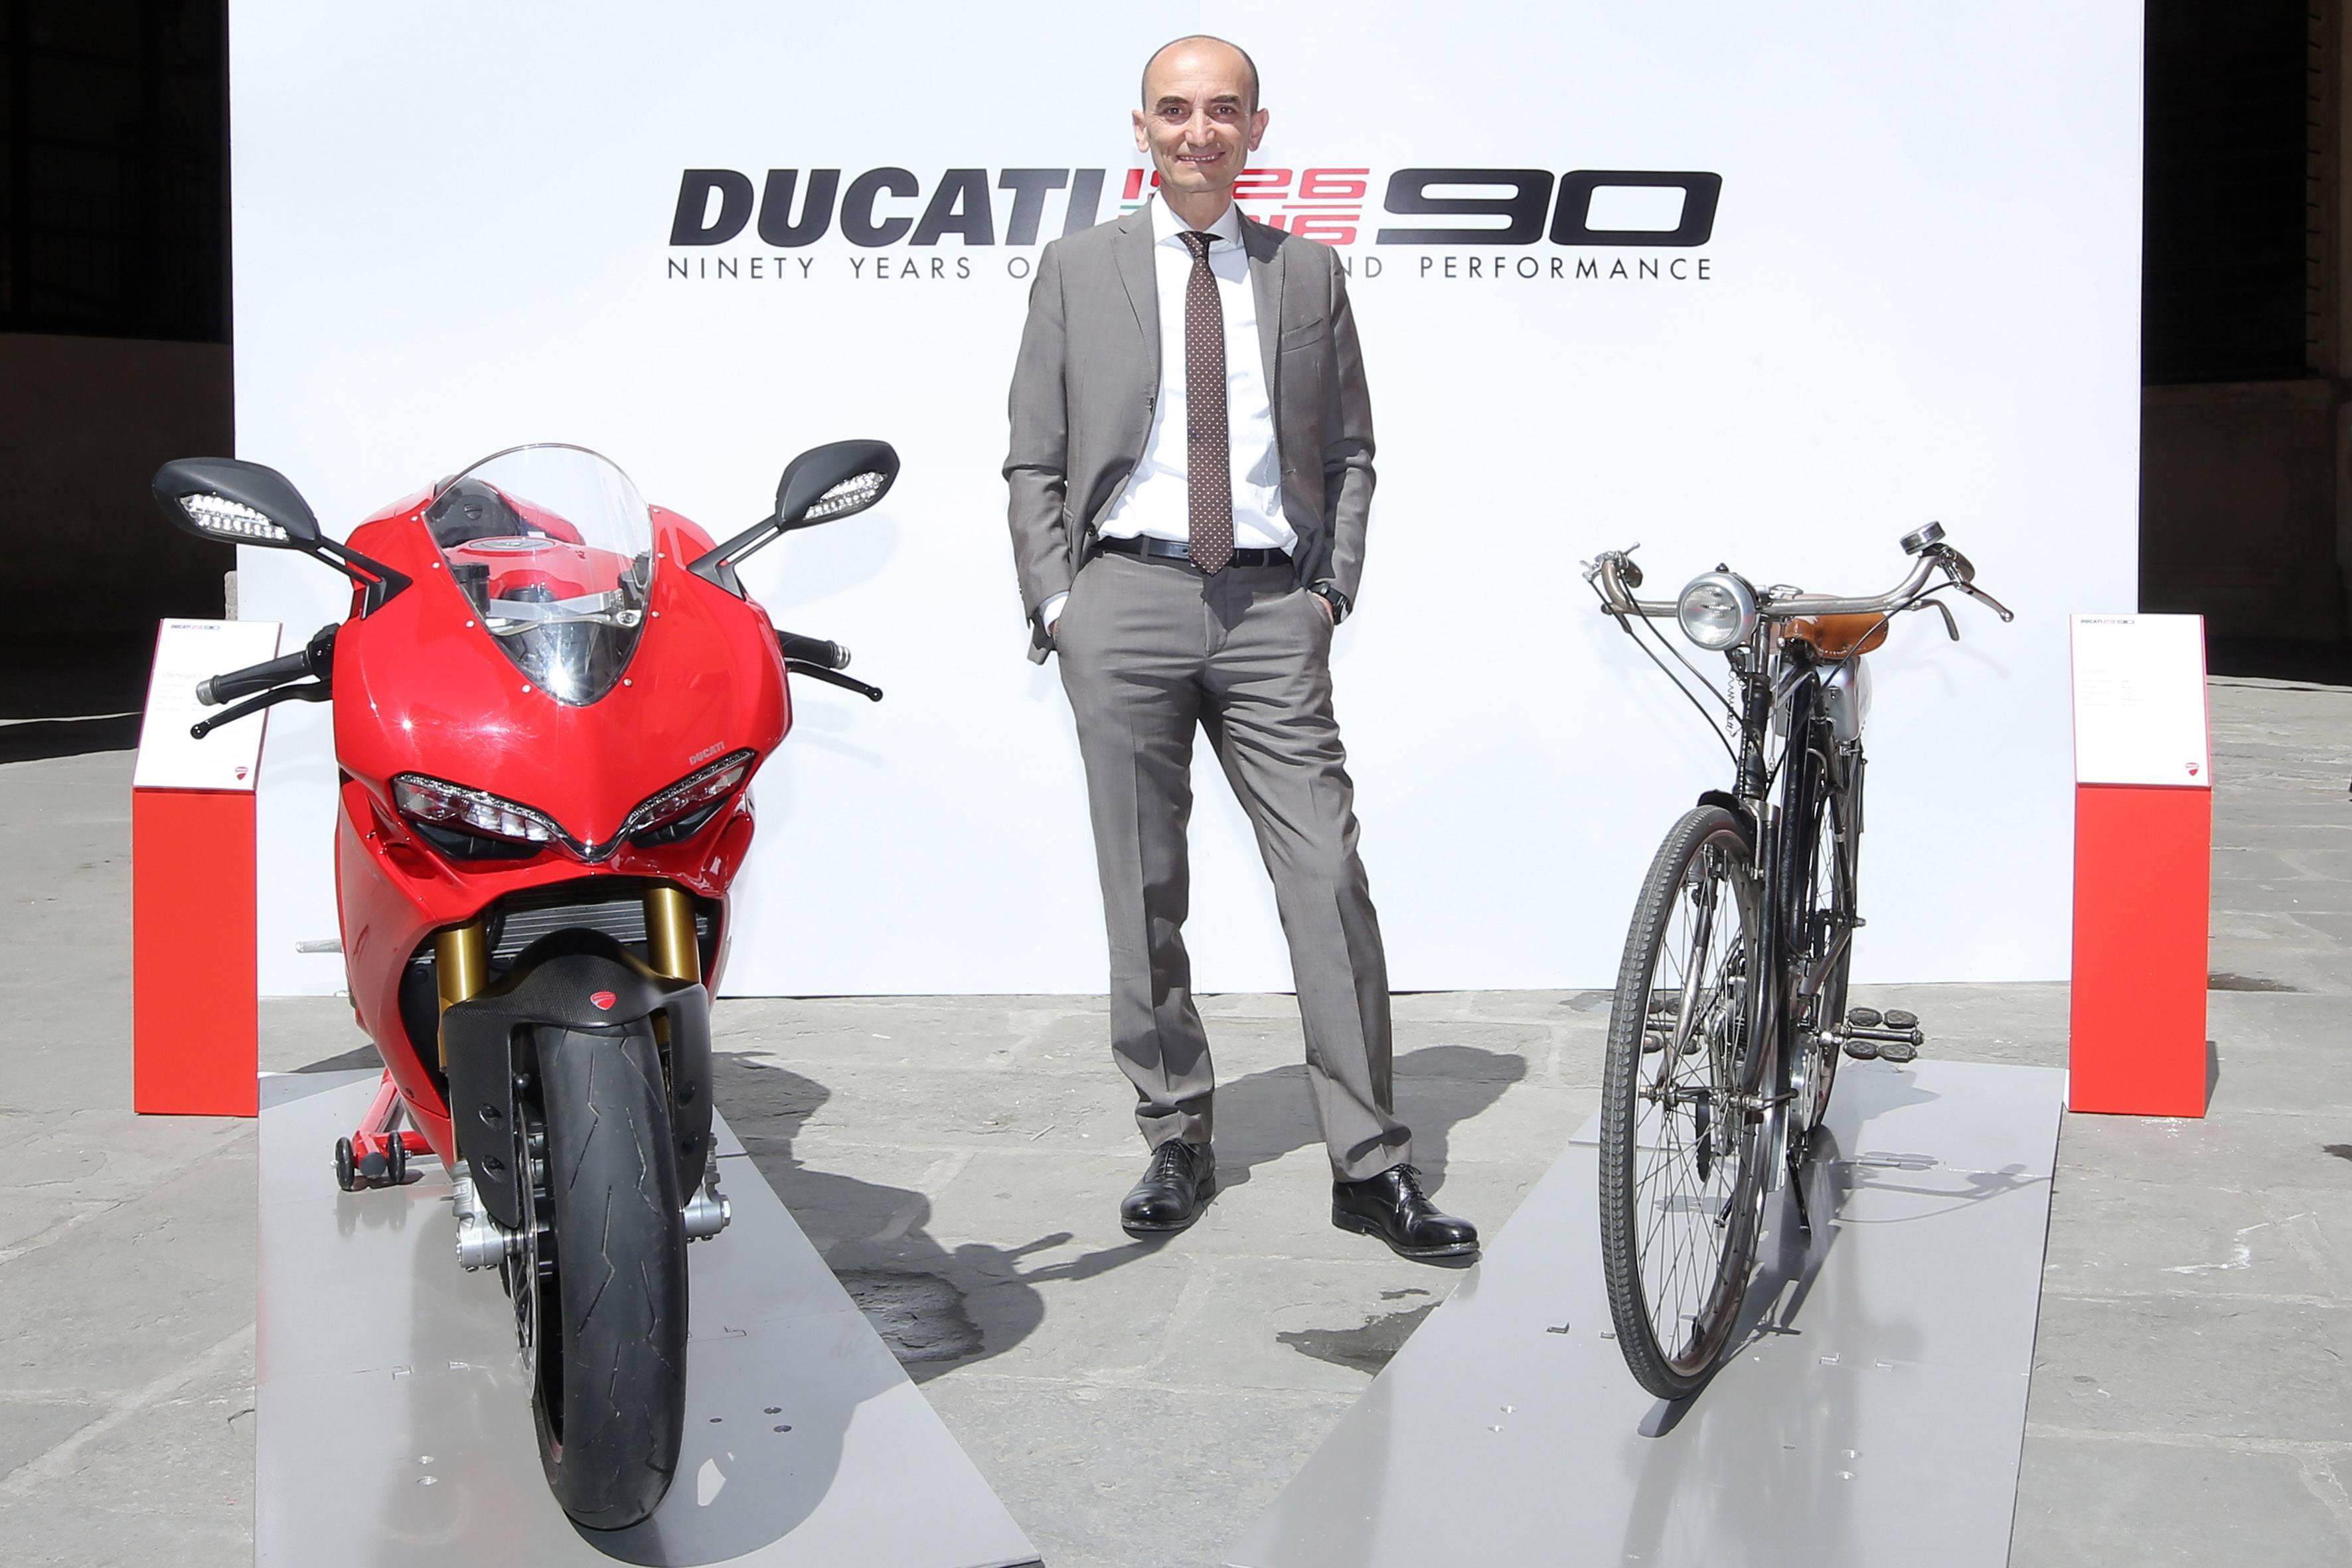 Ducati prepara su 90 Aniversario